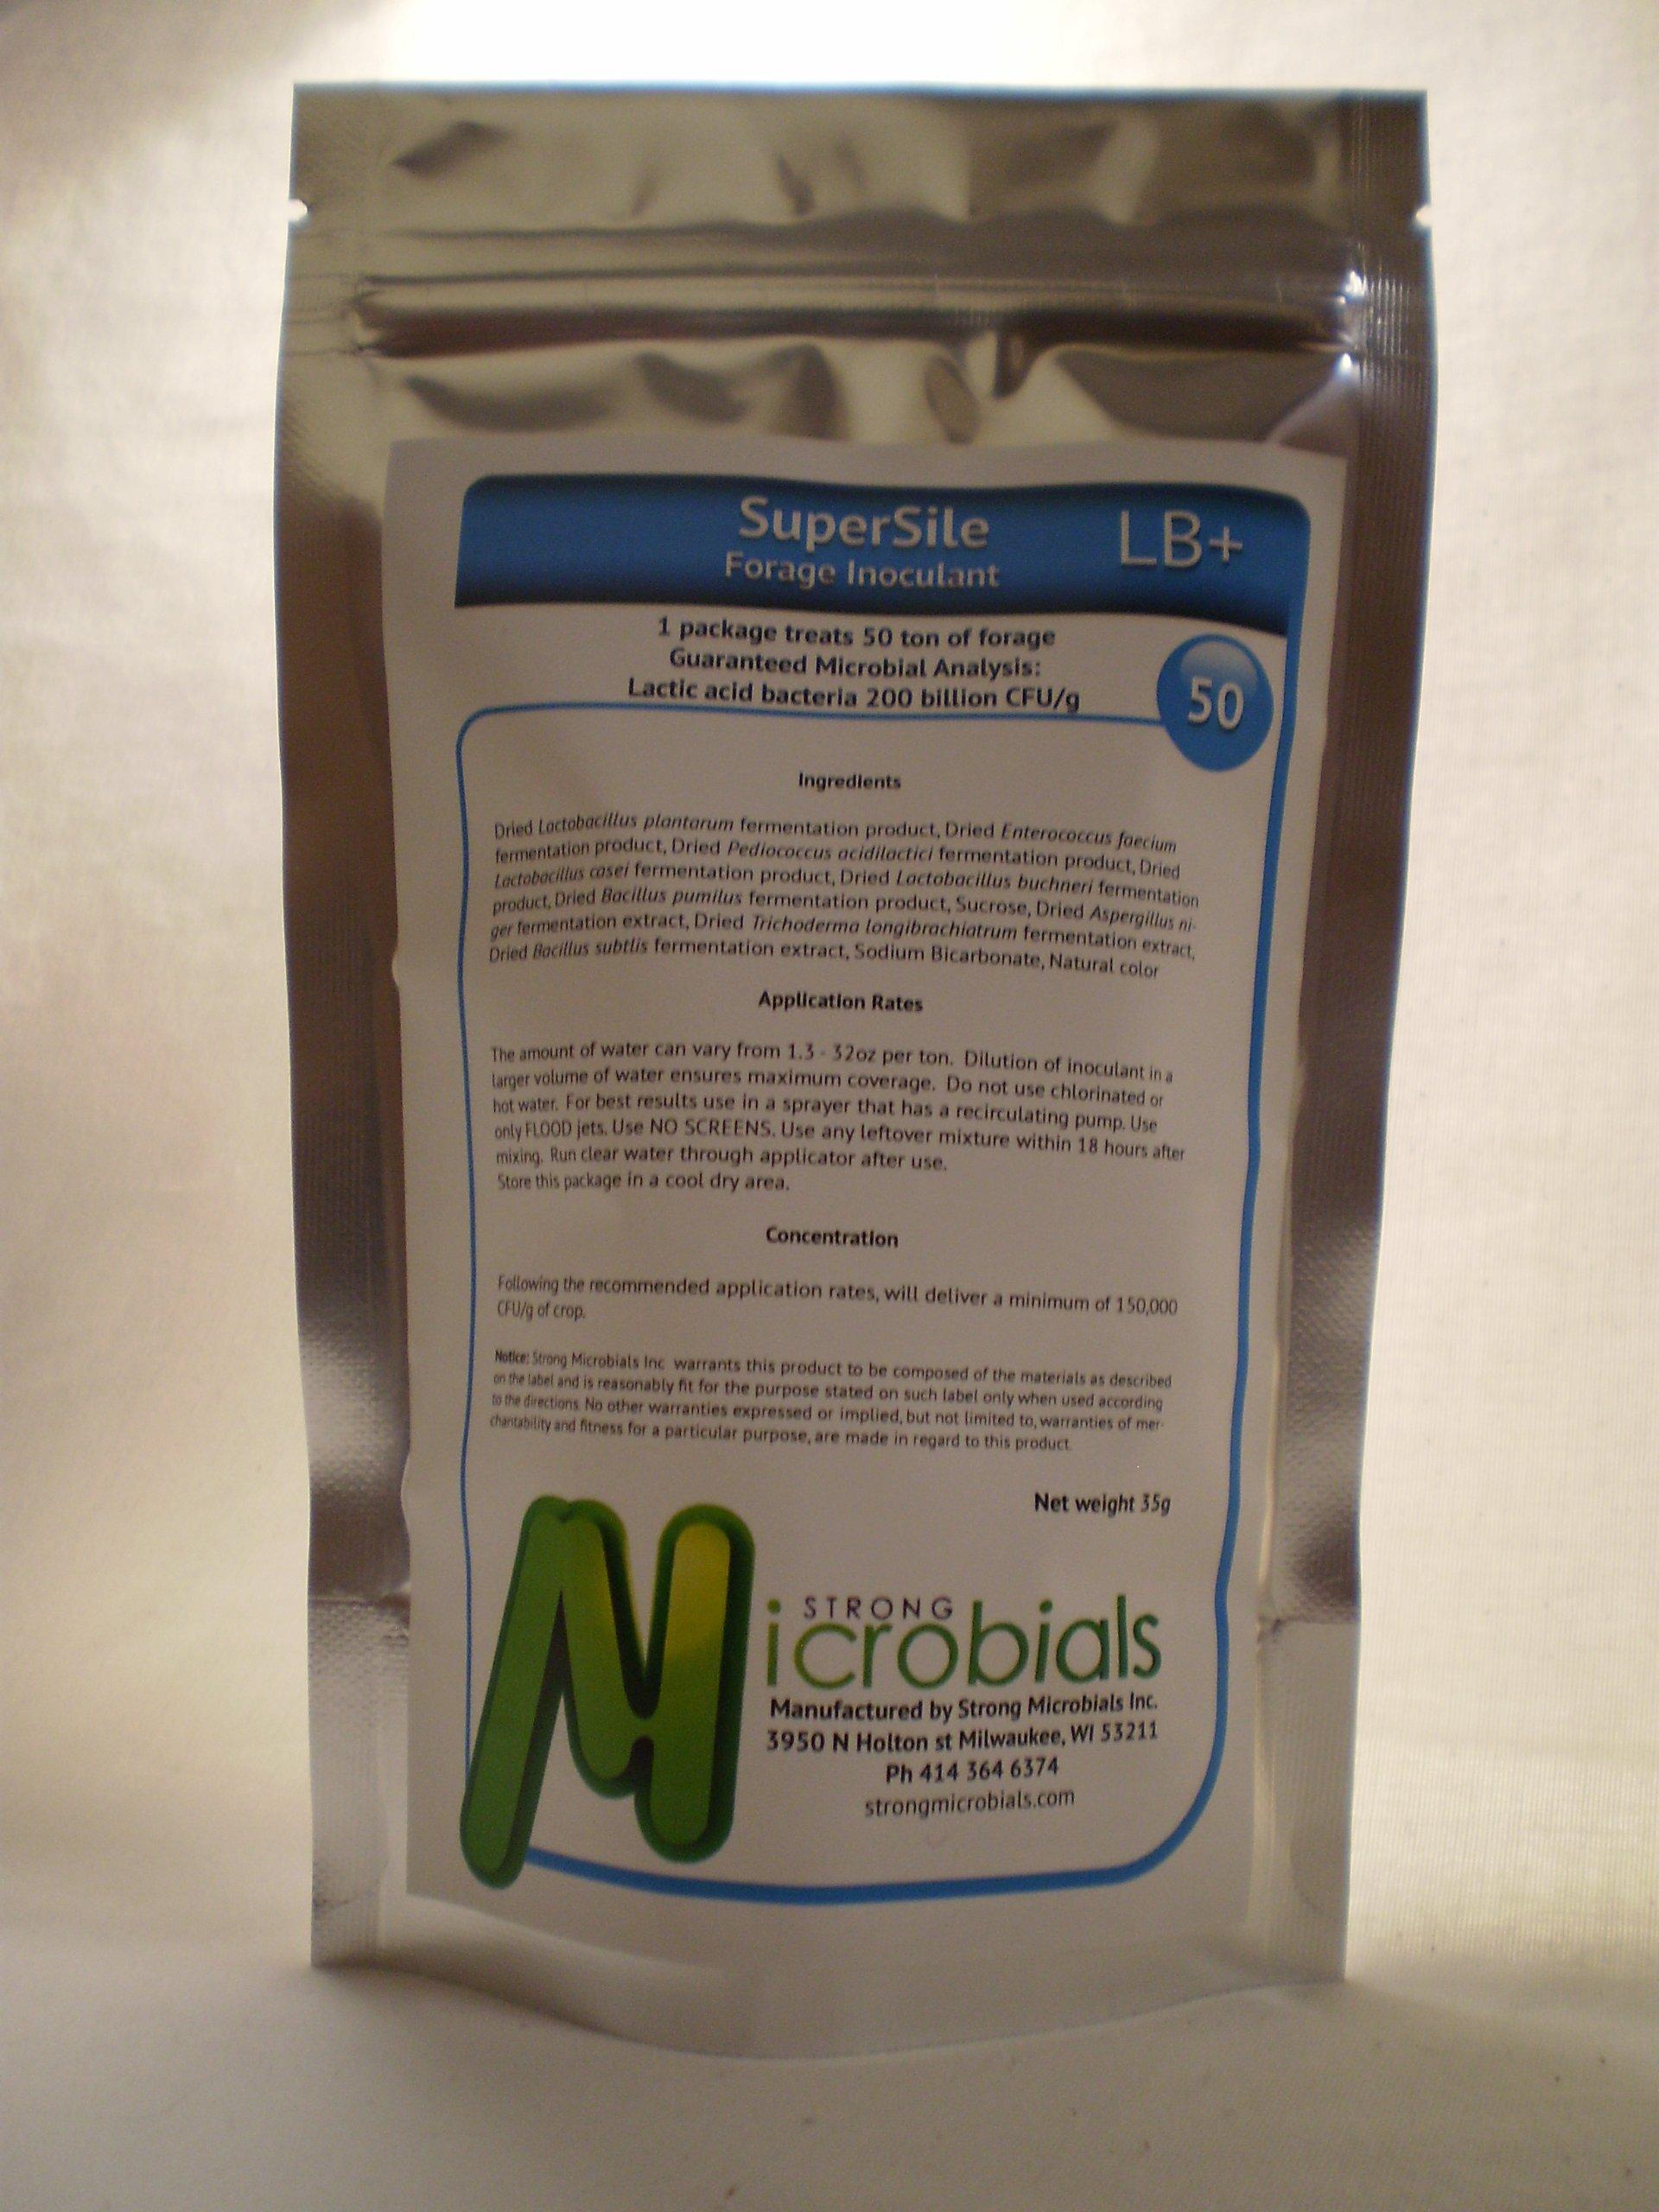 SuperSile Forage Inoculant LB+ 50 ton (L. buchneri) by SuperSile